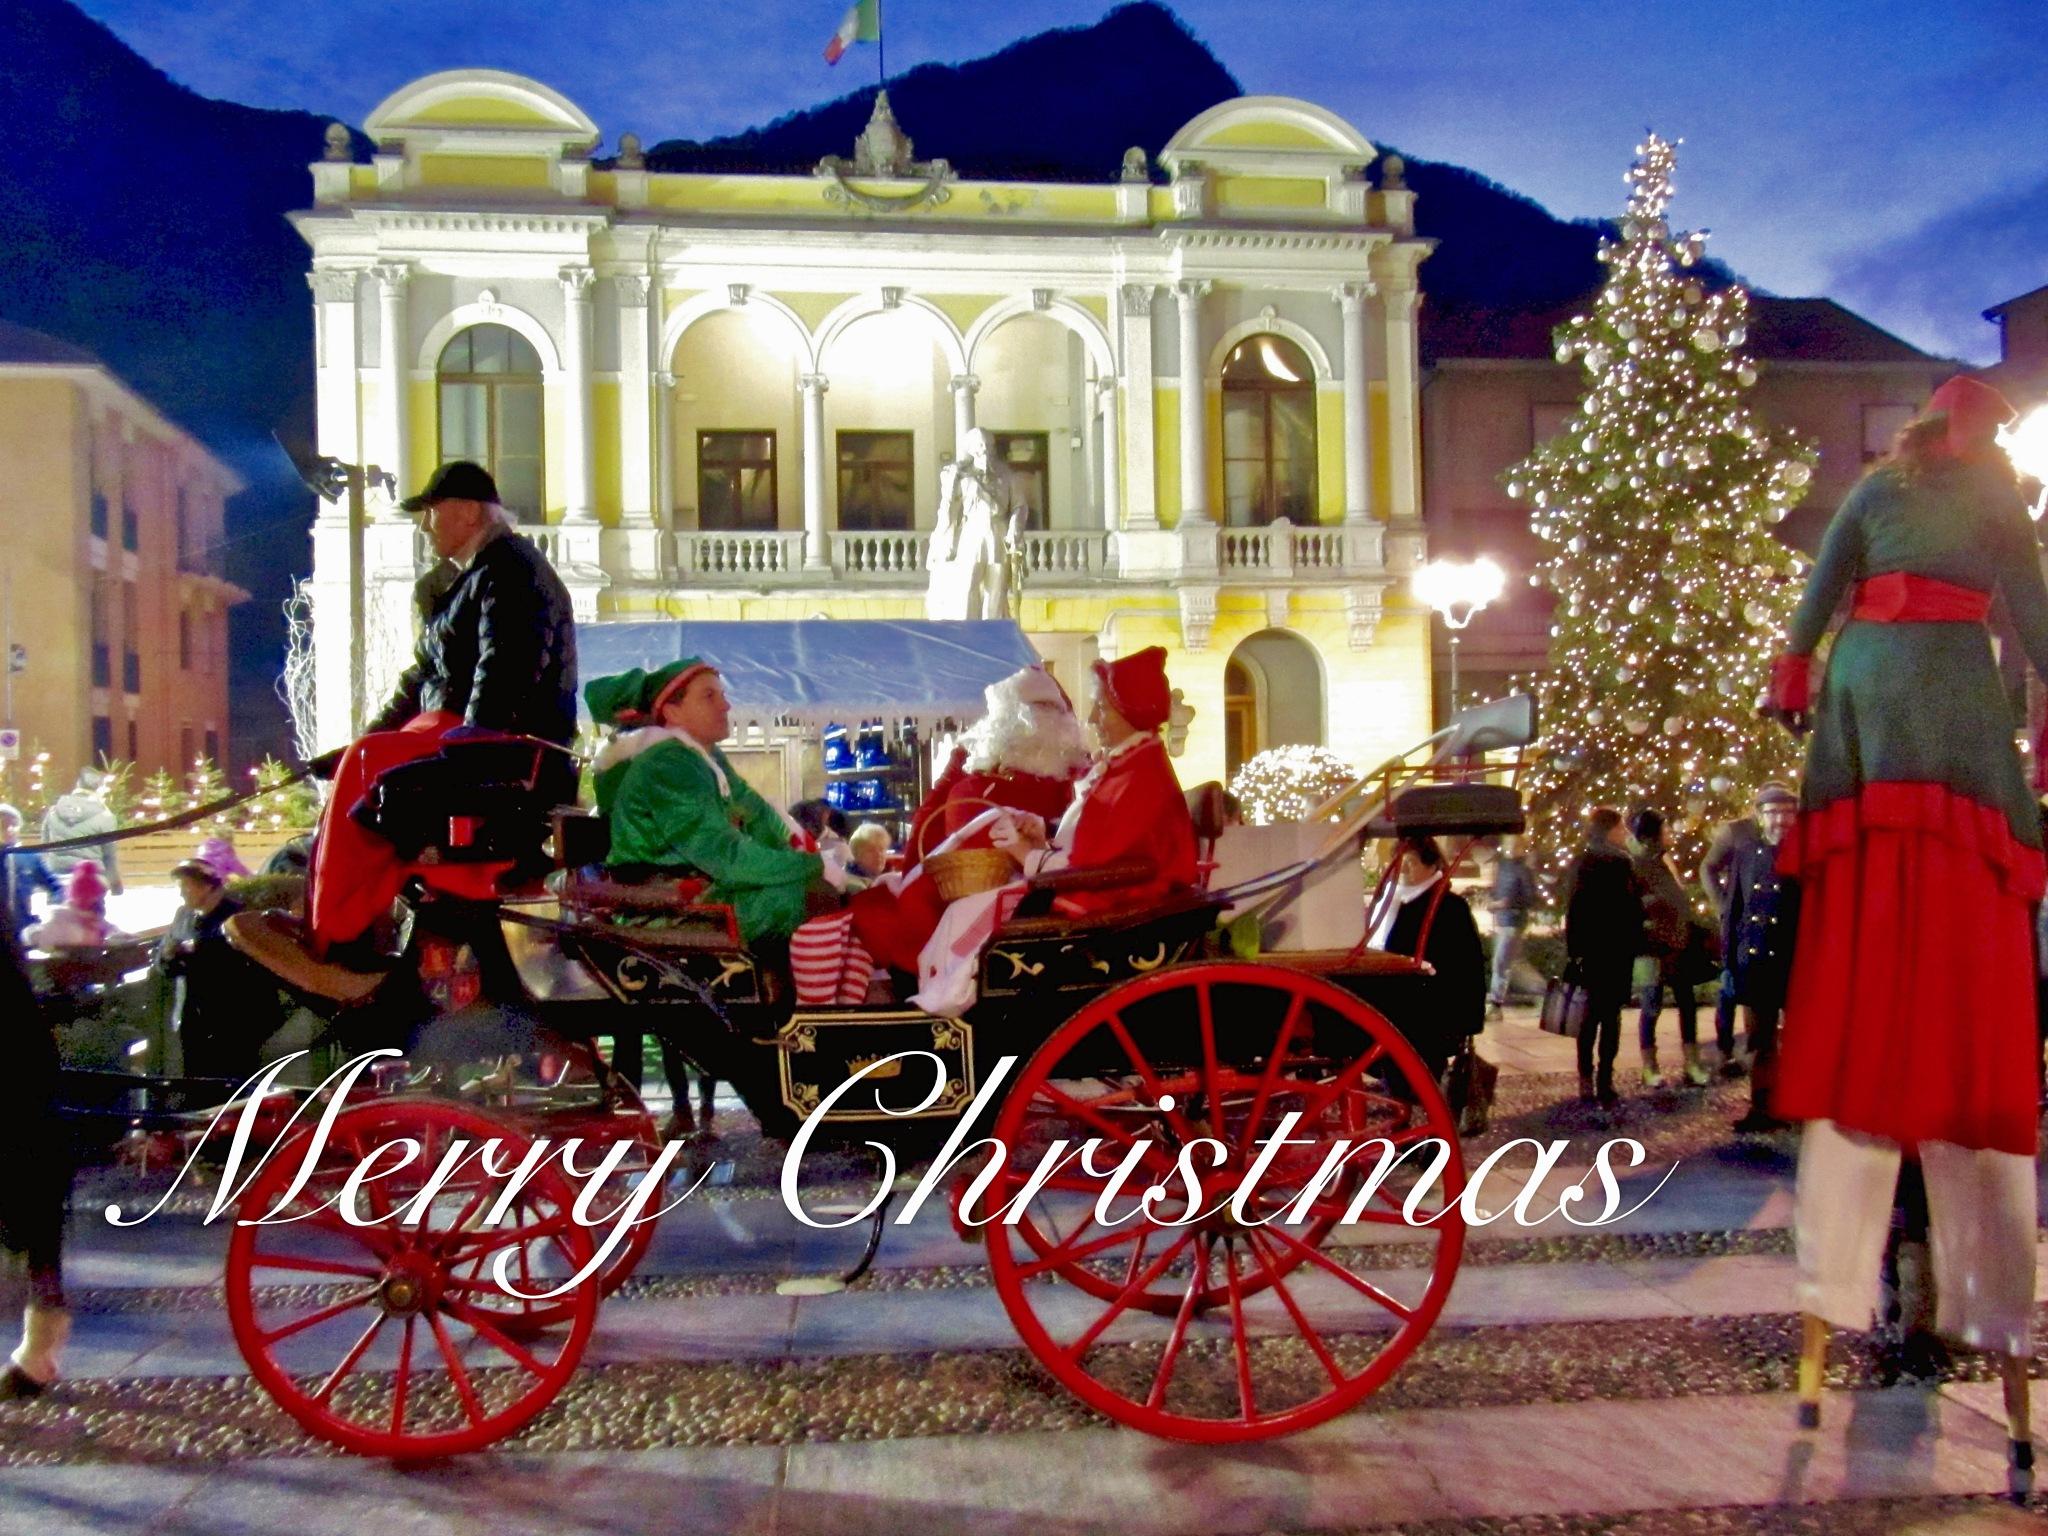 Santa's coming ... by LoryC